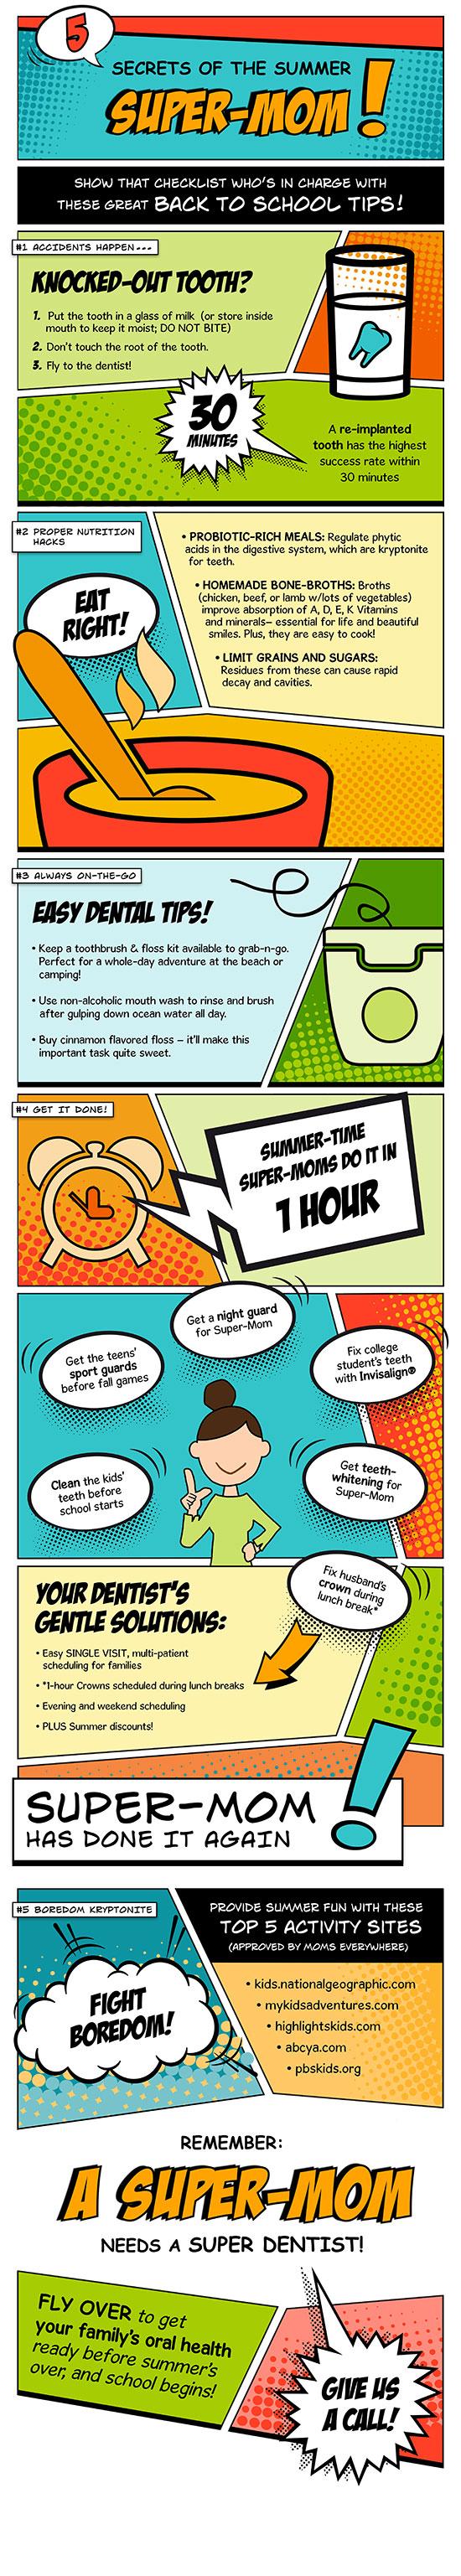 Secrets of a summer super mom infographic - Summer Tips for Moms